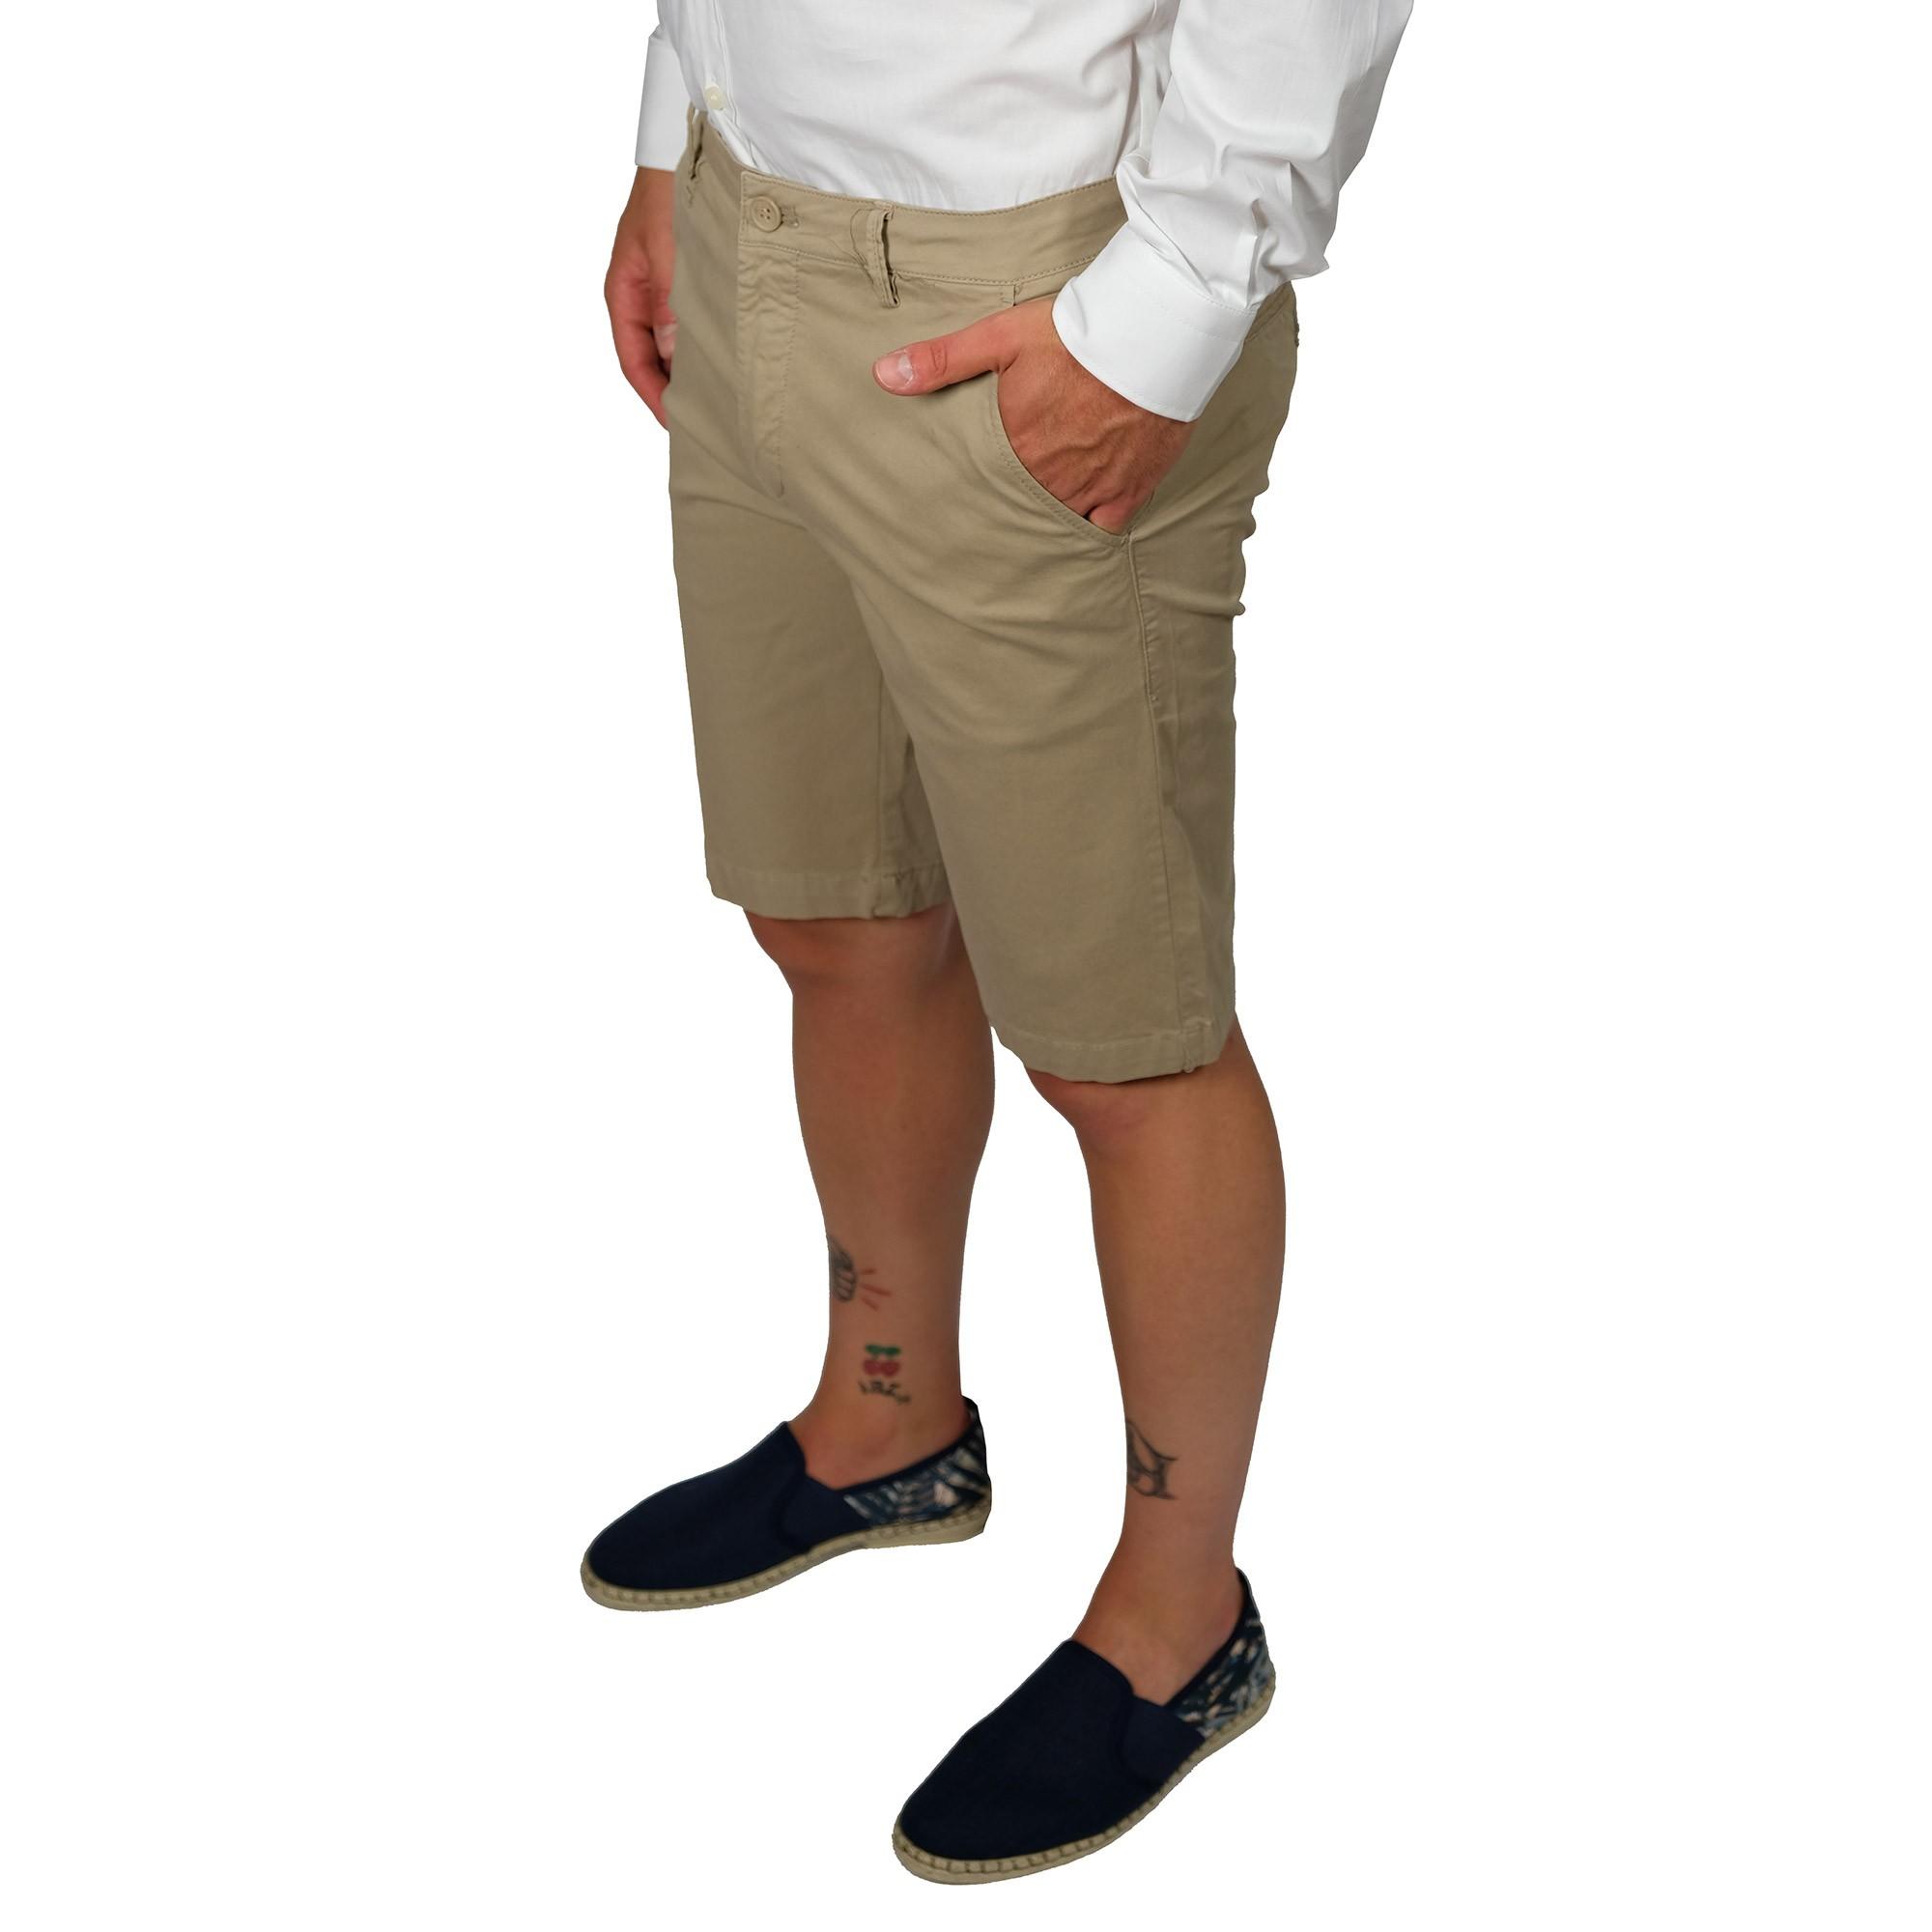 Bermuda-Uomo-Cotone-Jeans-Pantaloncini-Pantaloni-Corti-Tasca-America-Slim-Shorts miniatura 12